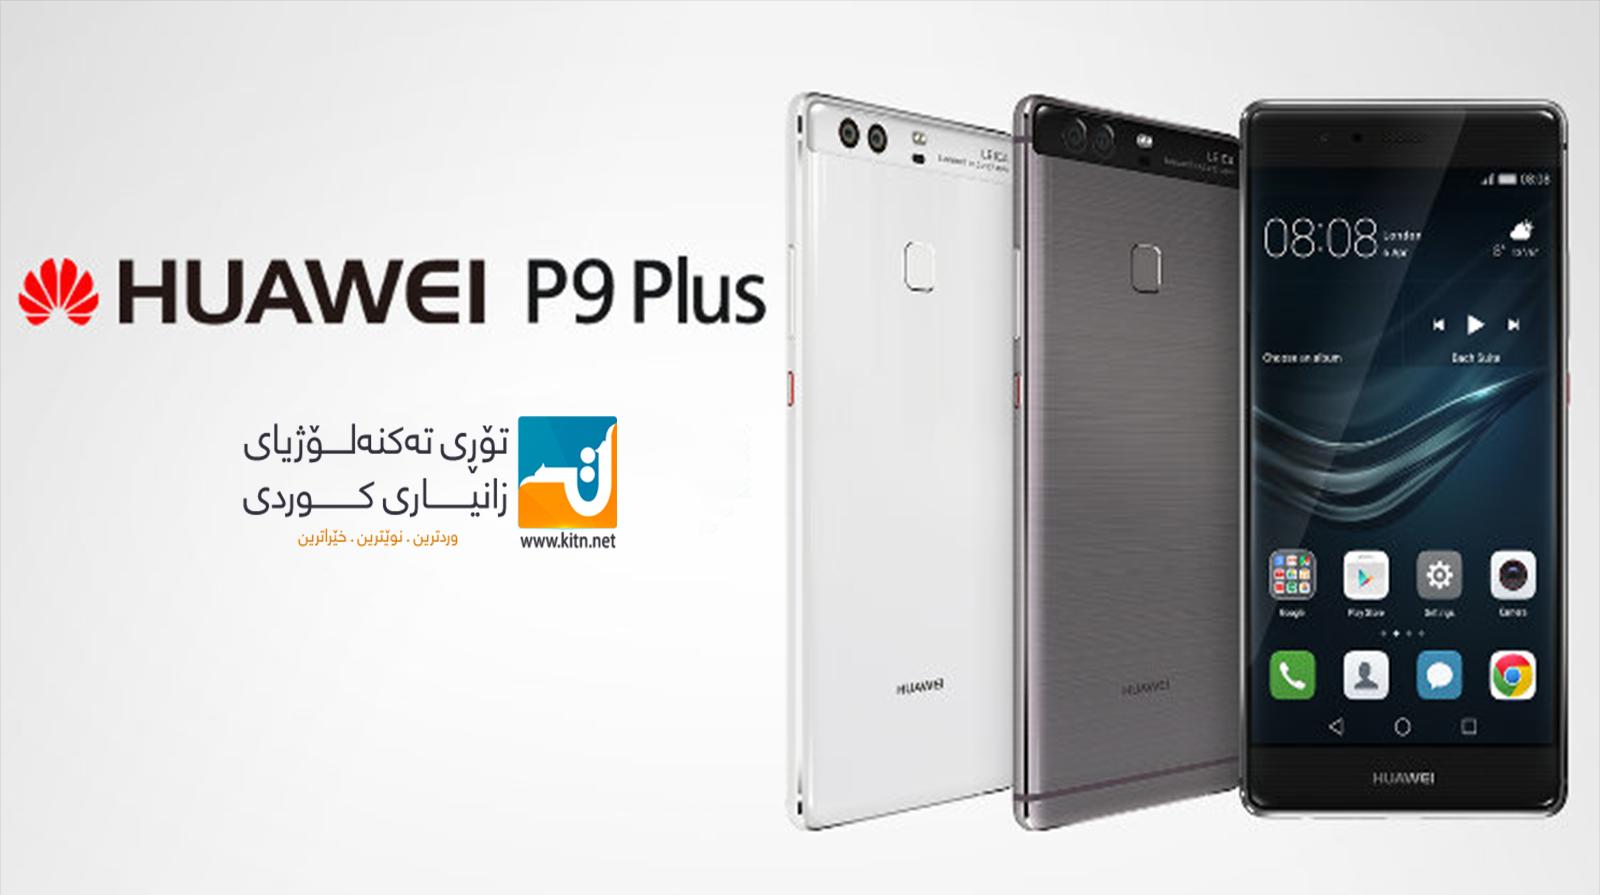 HuaweiP9Plus